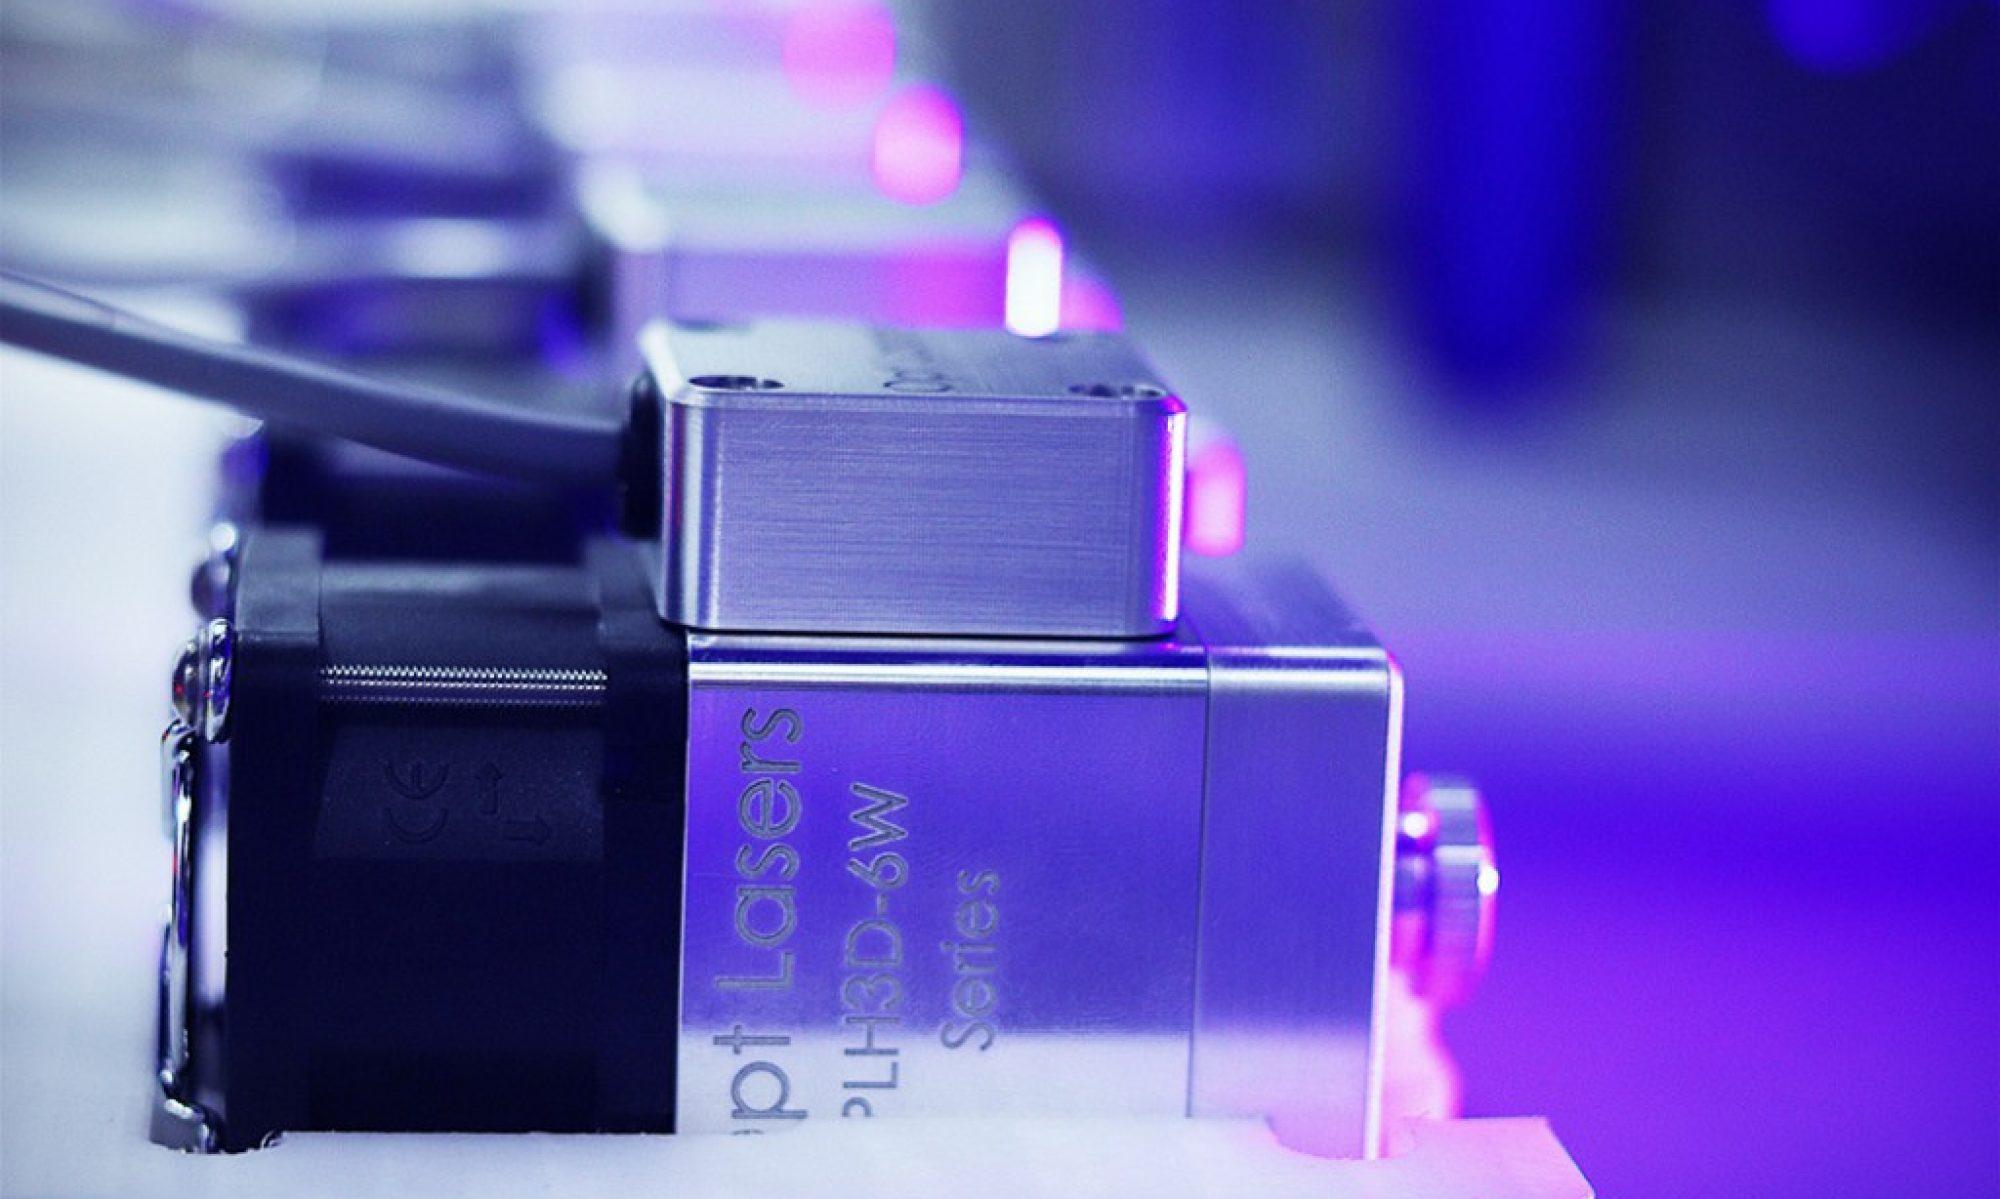 Opt Lasers - lasery do maszyn CNC i drukarek 3D